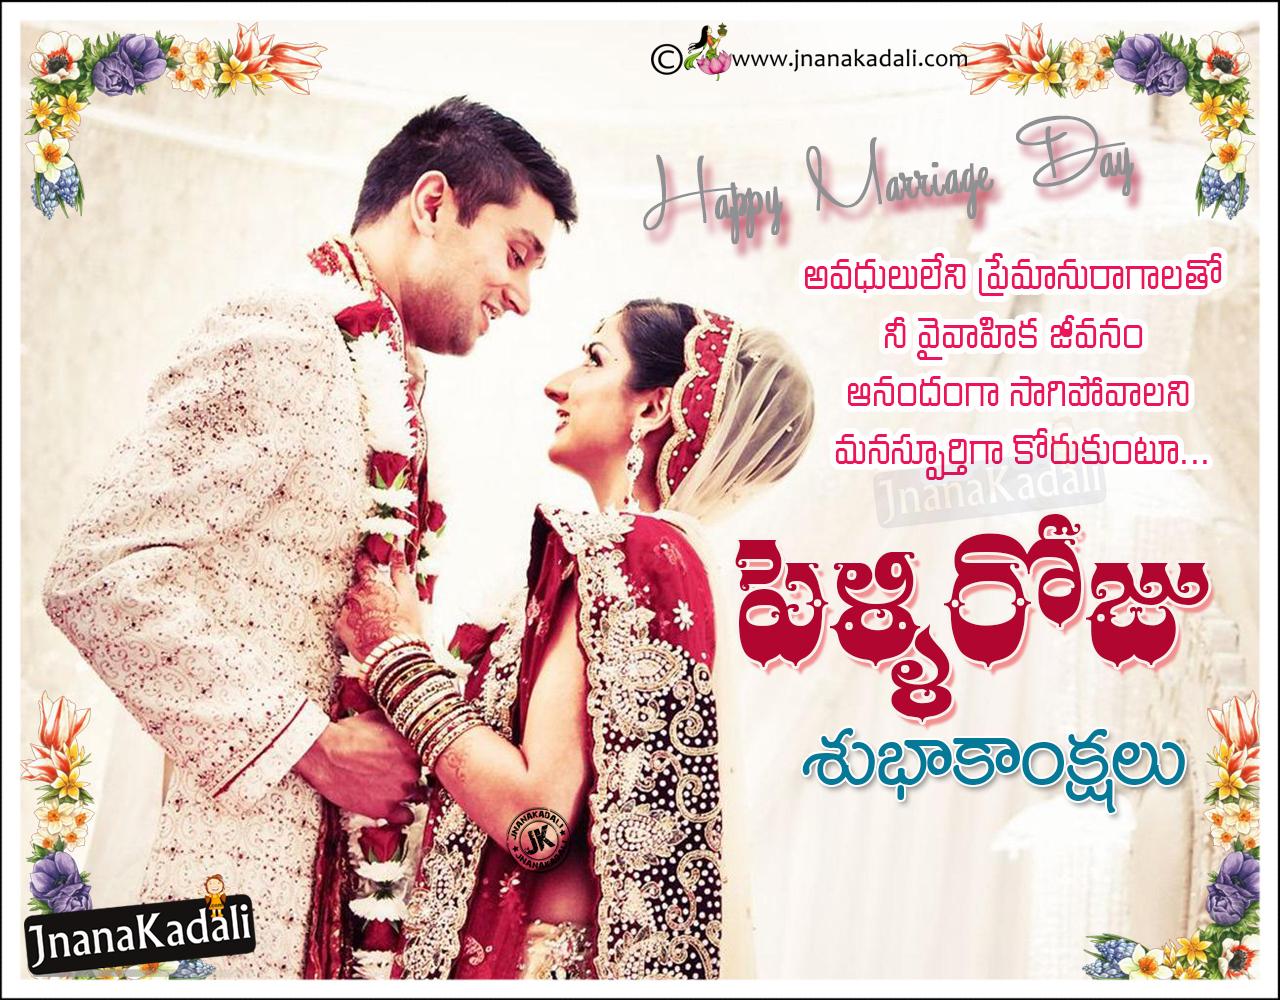 Telugu Pelli Roju Subhakankshalu Greetings Happy Wedding Day